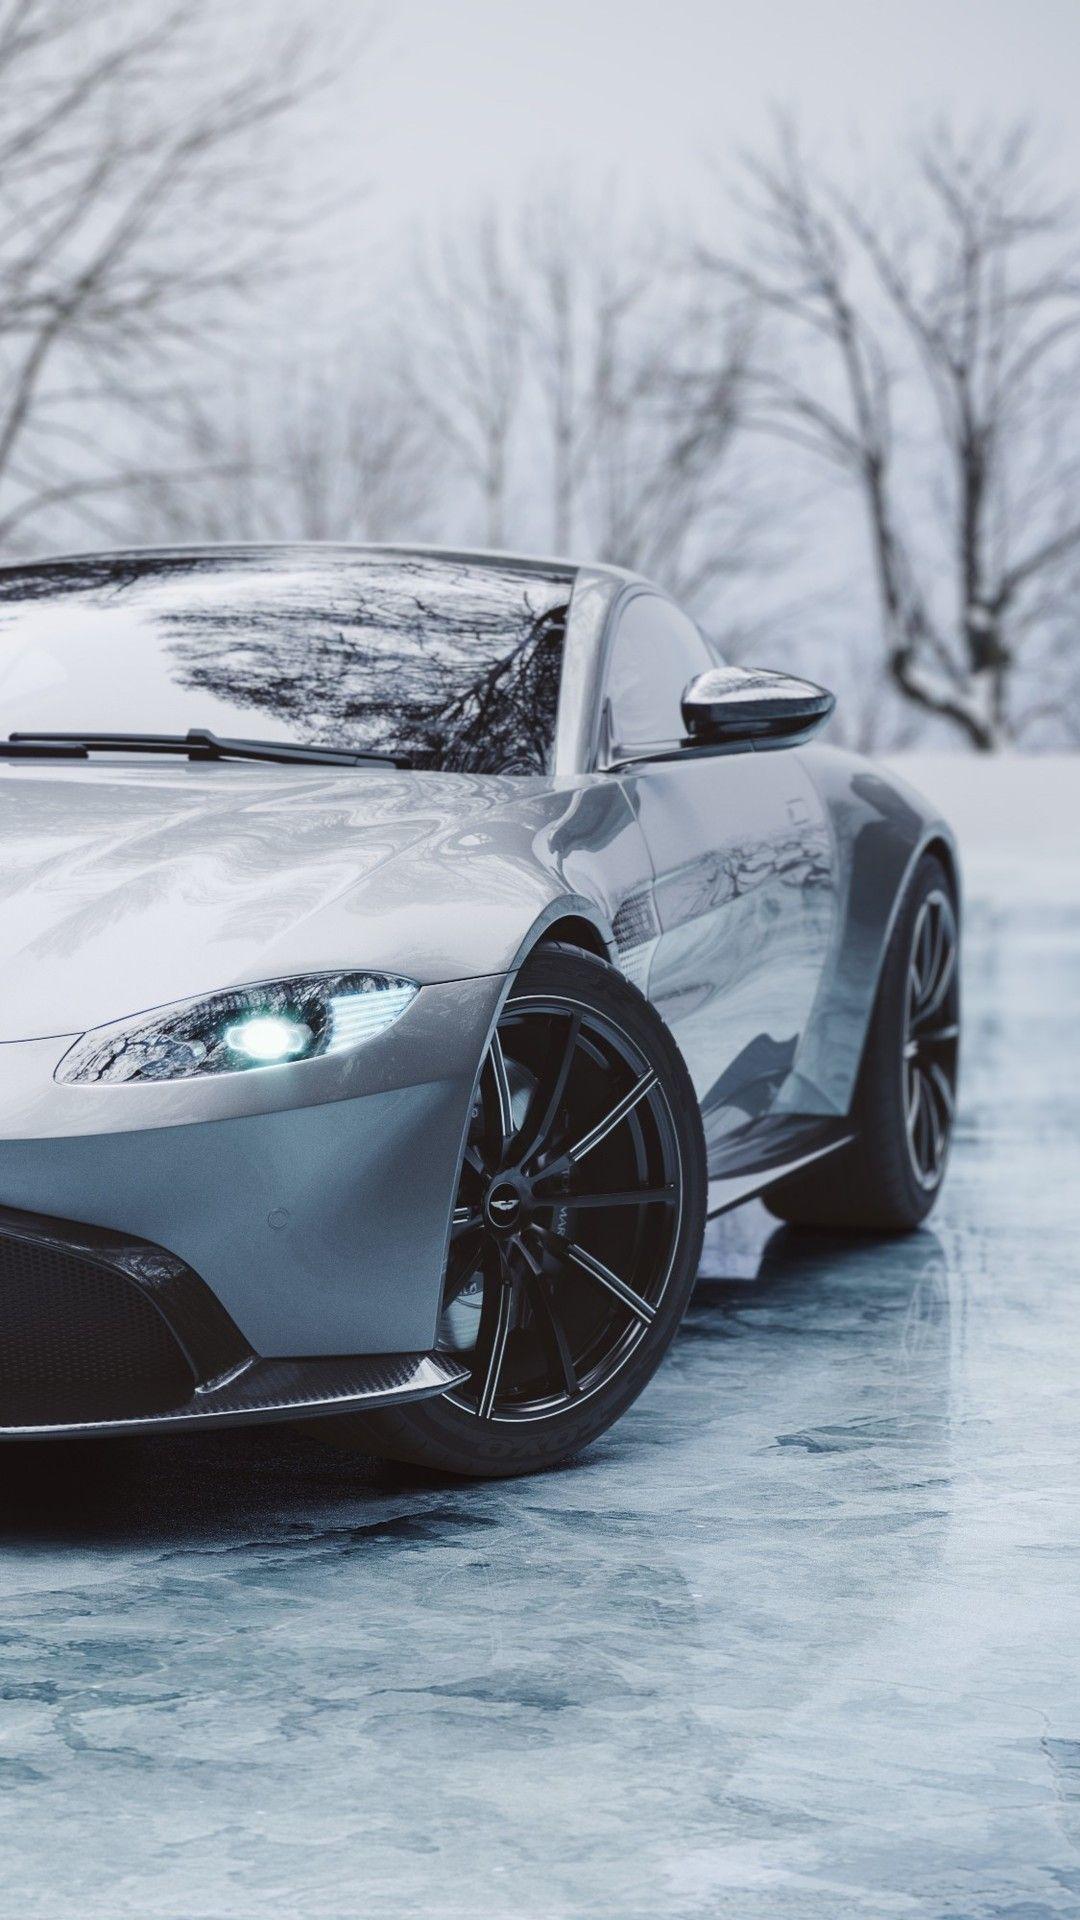 Ice Cold Aston Martin Vantage In 1080x1920 Resolution Aston Martin Vantage Aston Martin Cars Aston Martin